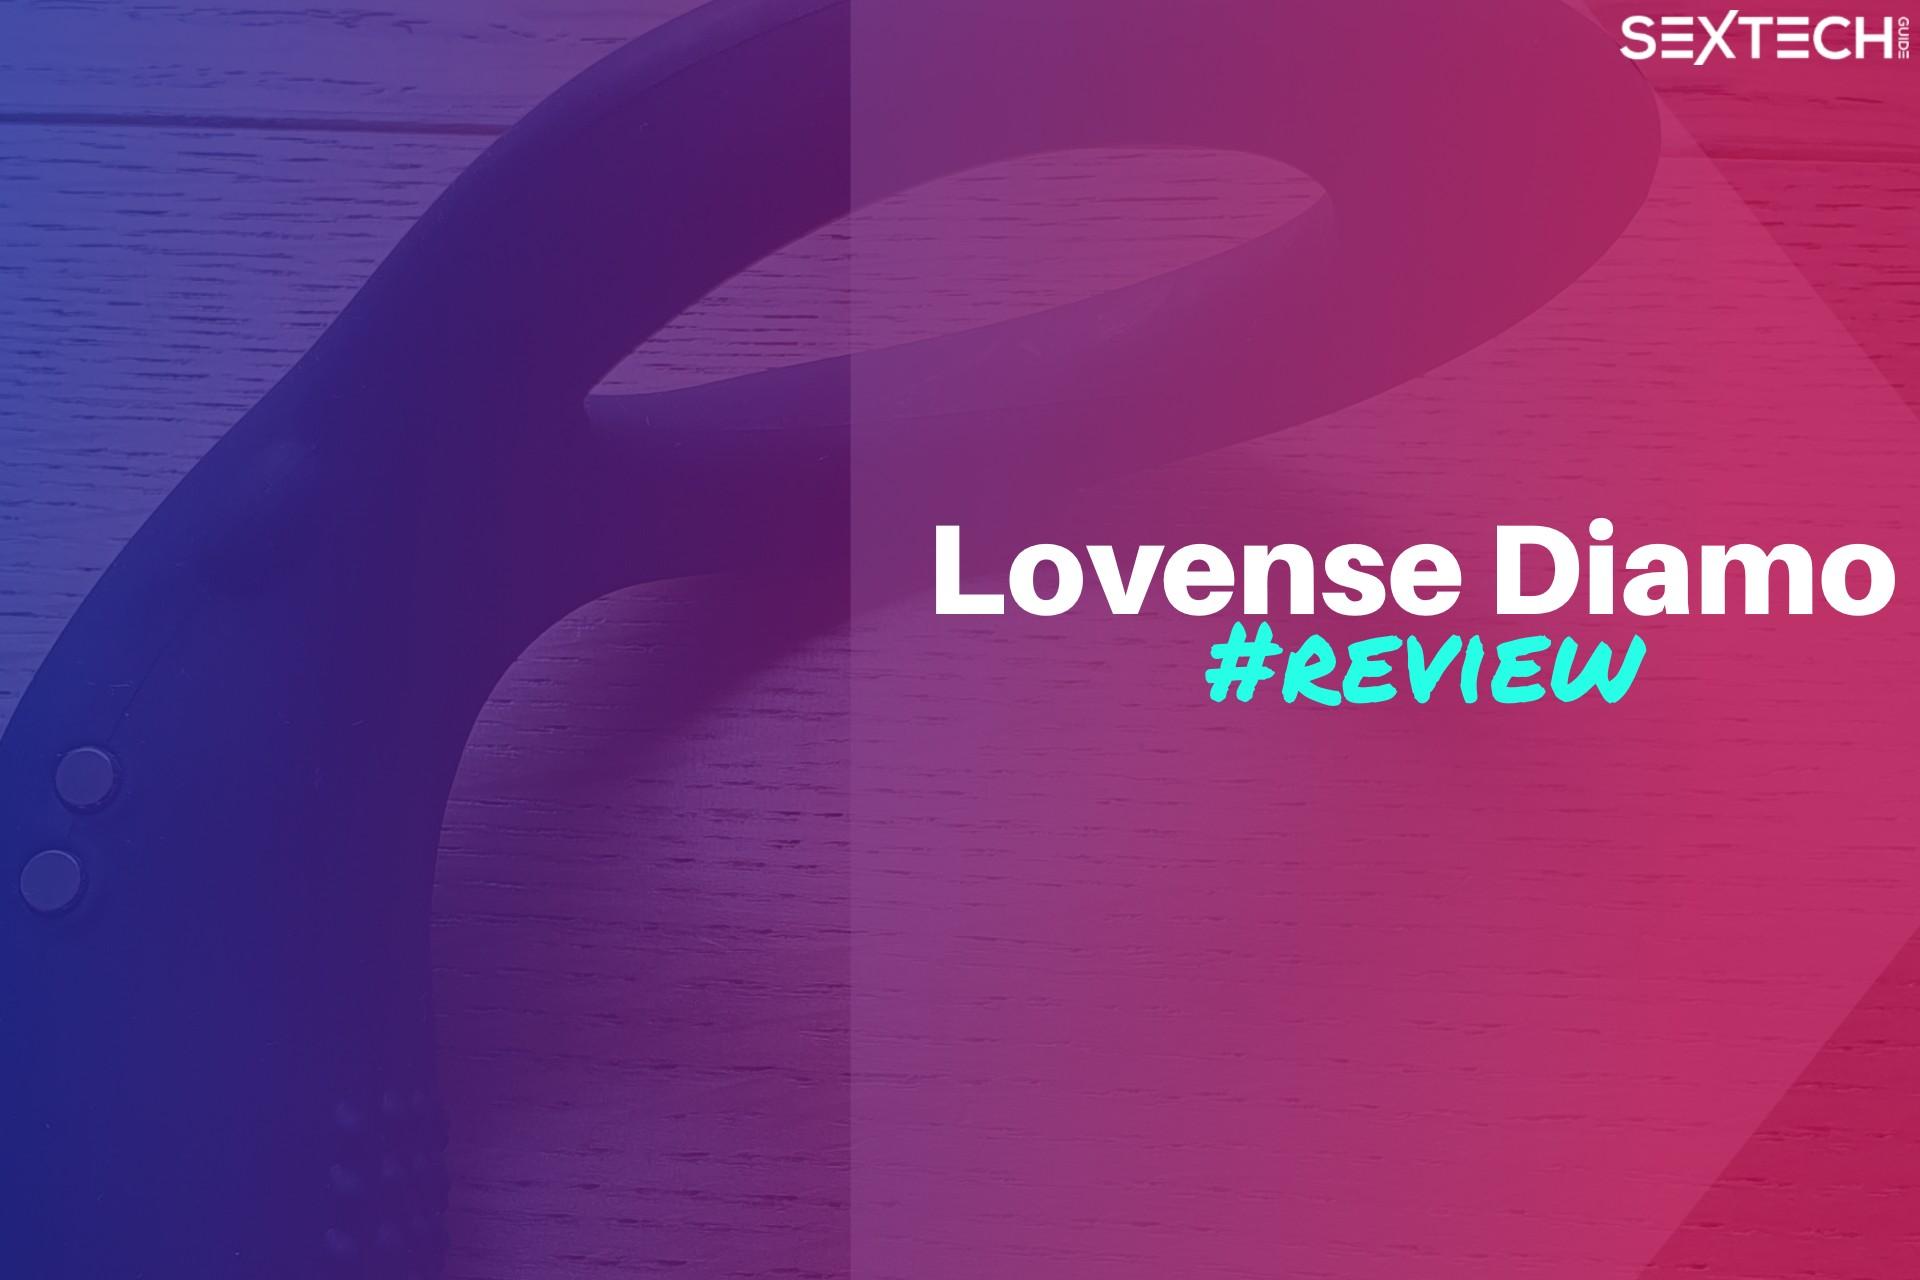 Lovense Diamo review